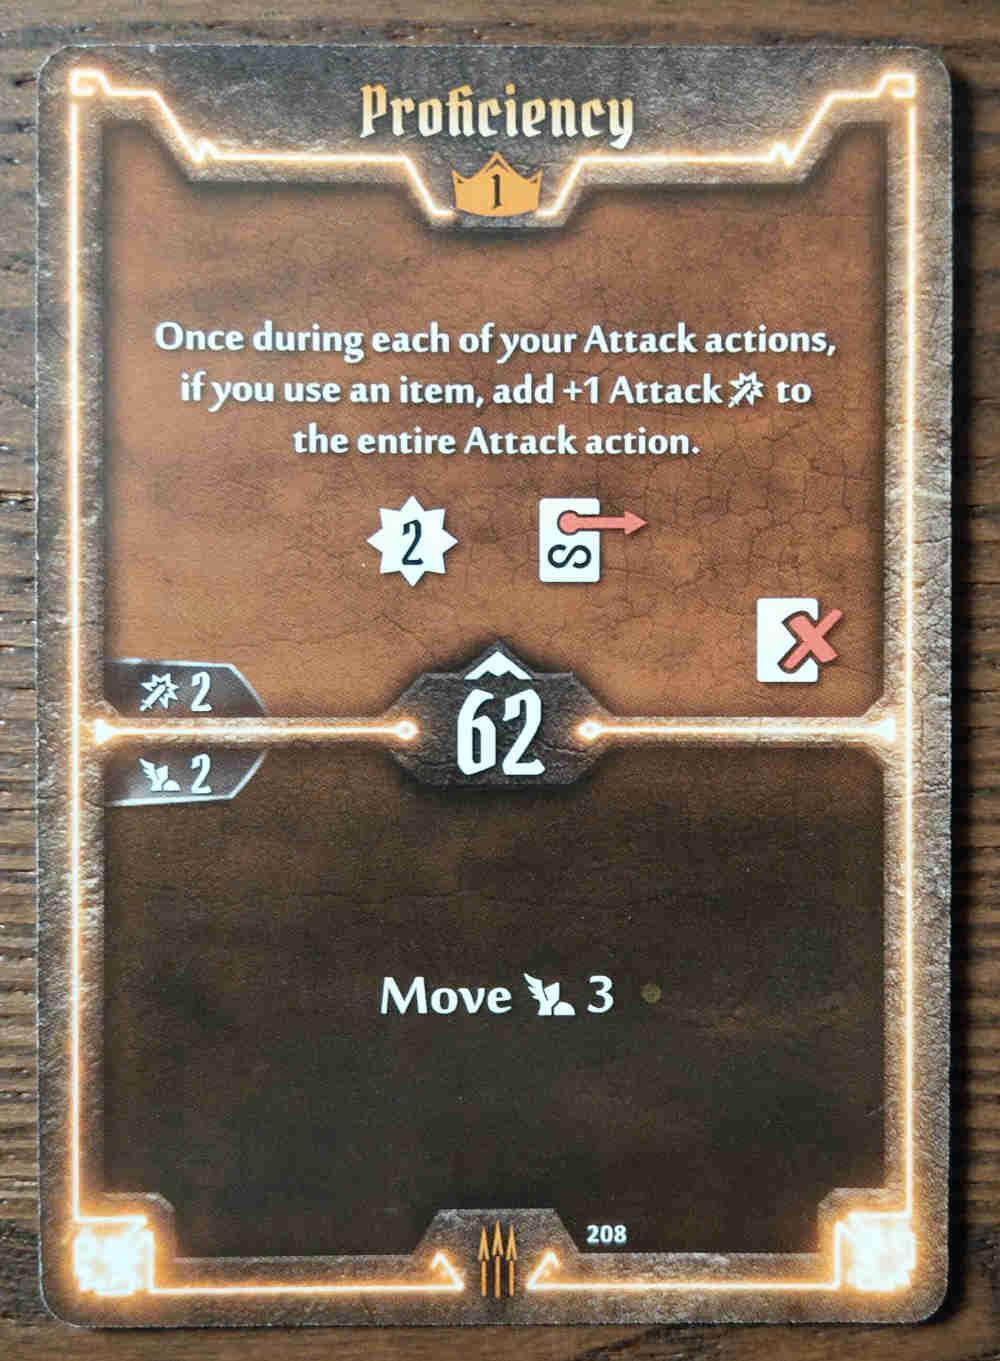 Level 1 Quartermaster card Proficiency